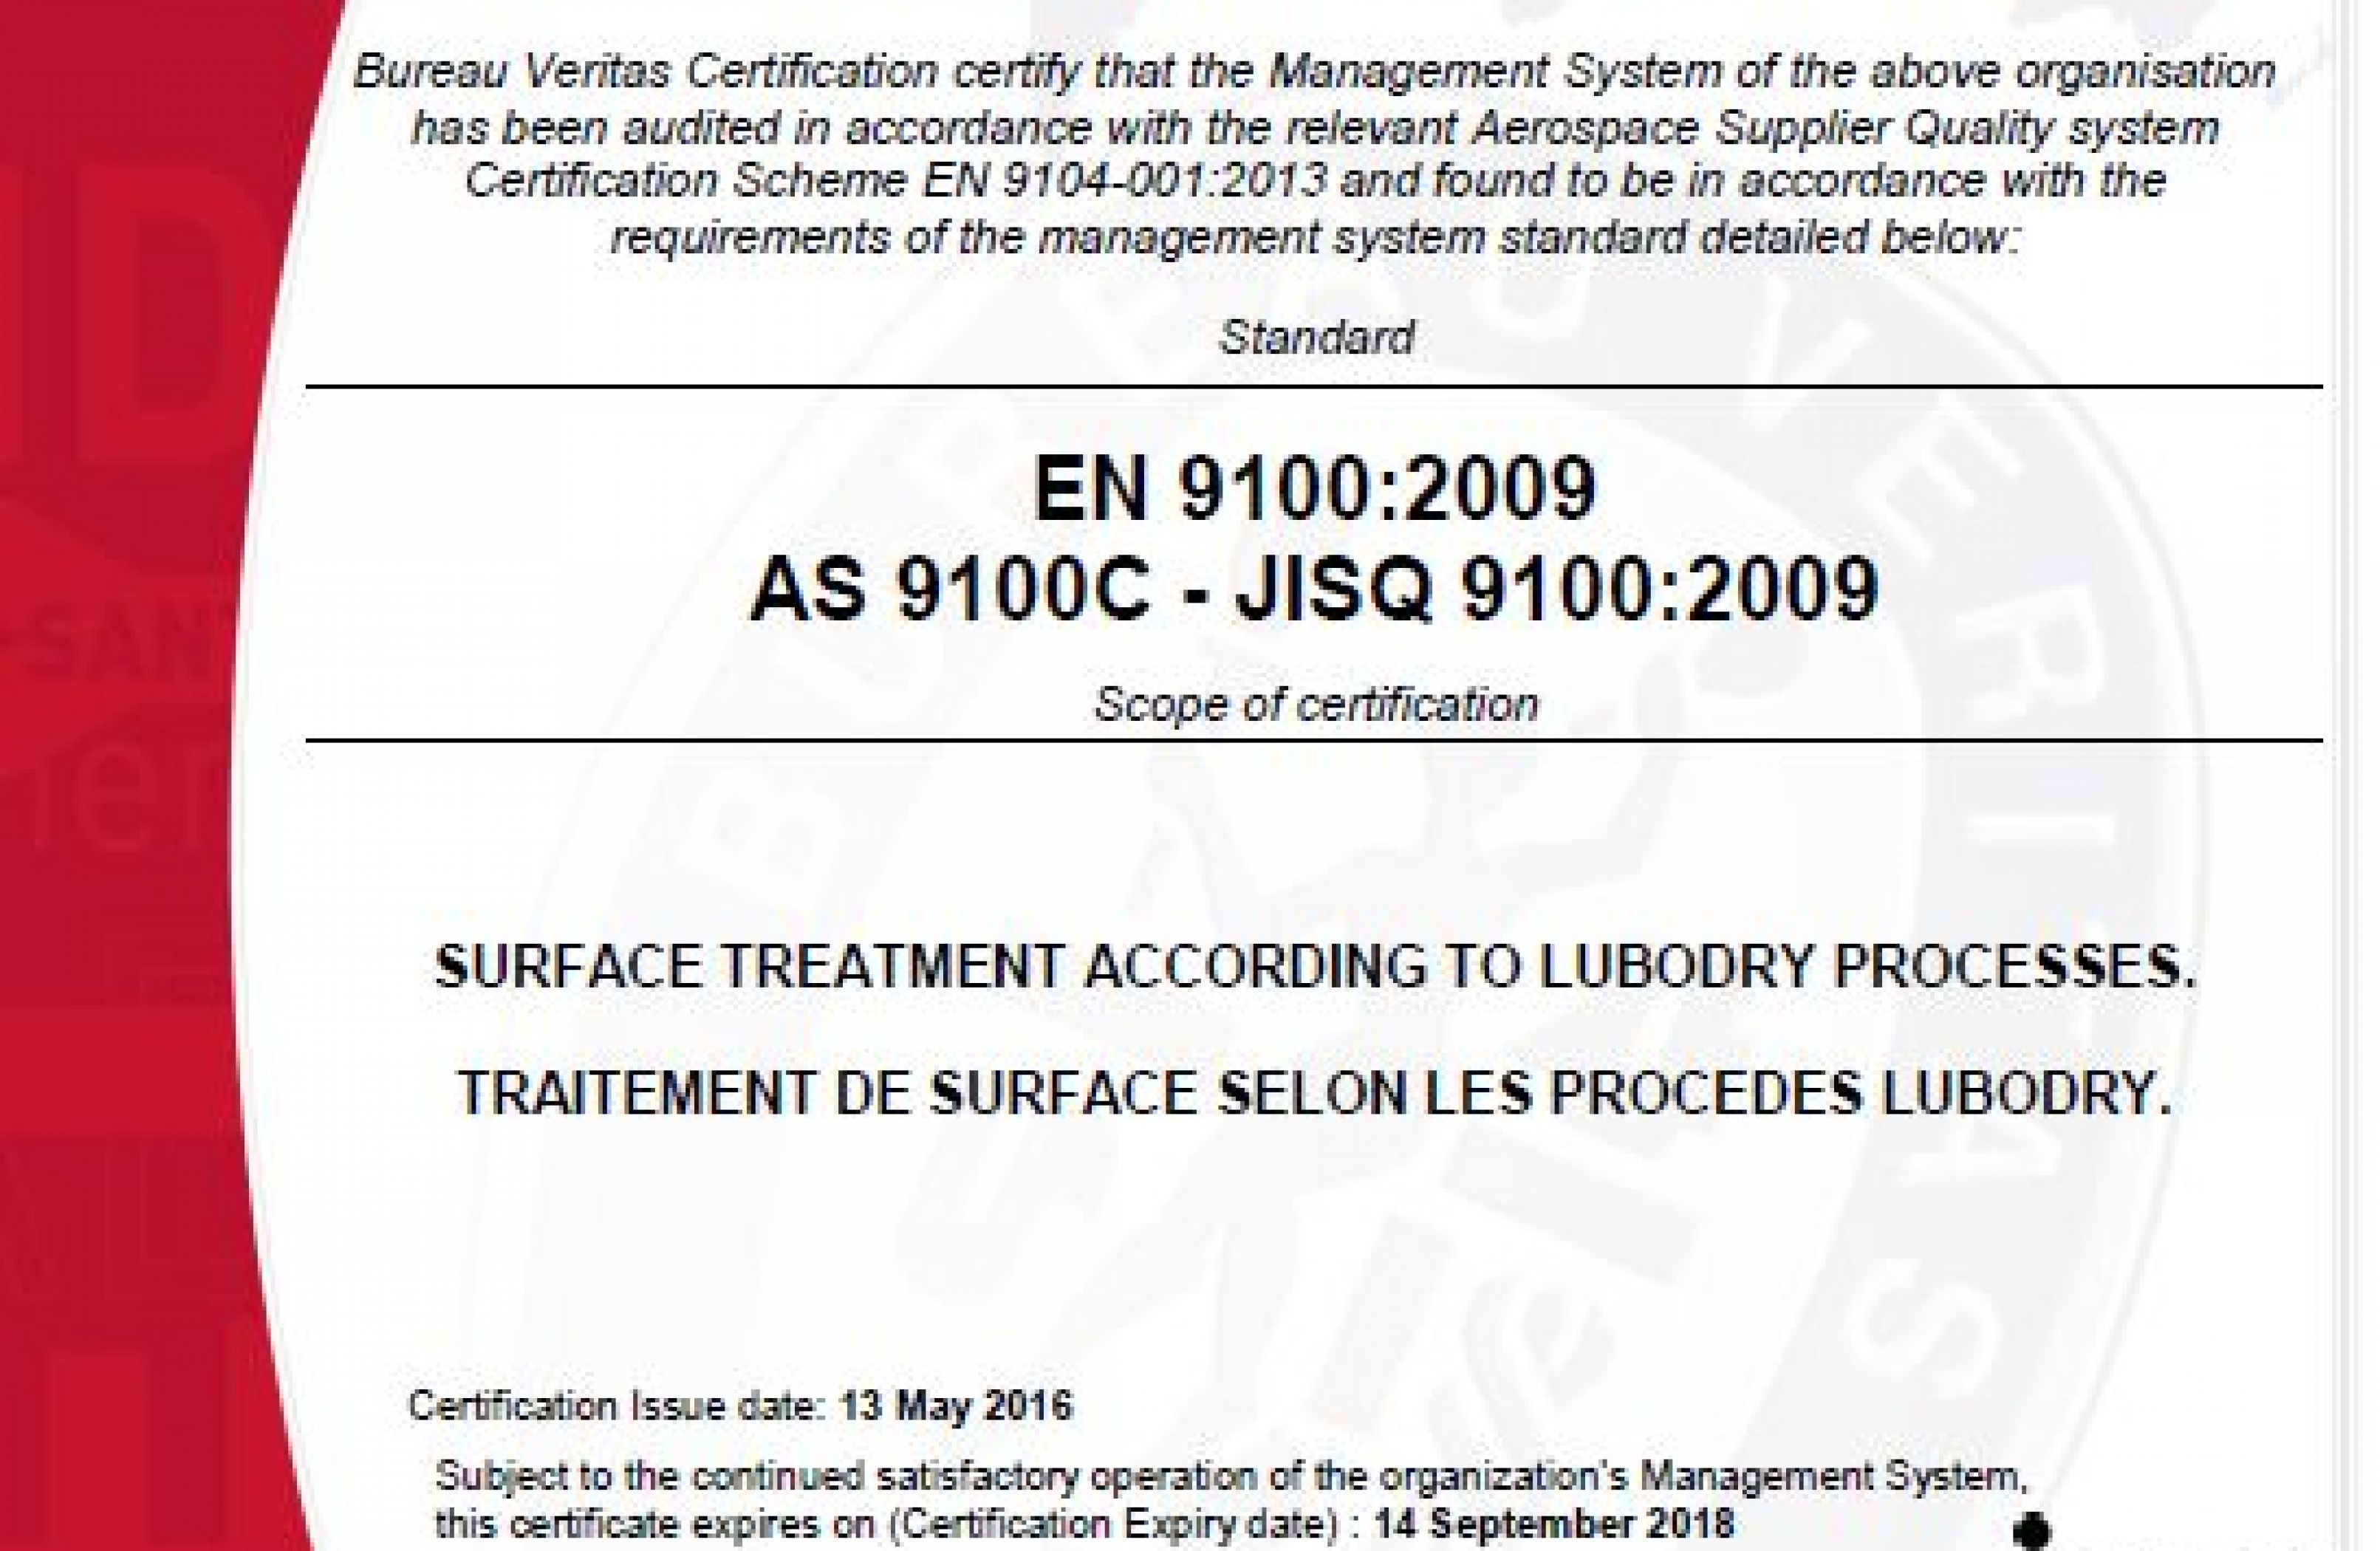 EN 9100 : 2009 / AS 9100 C / JISQ 9100 : 2009 Certification granted to LUBODRY Productions !